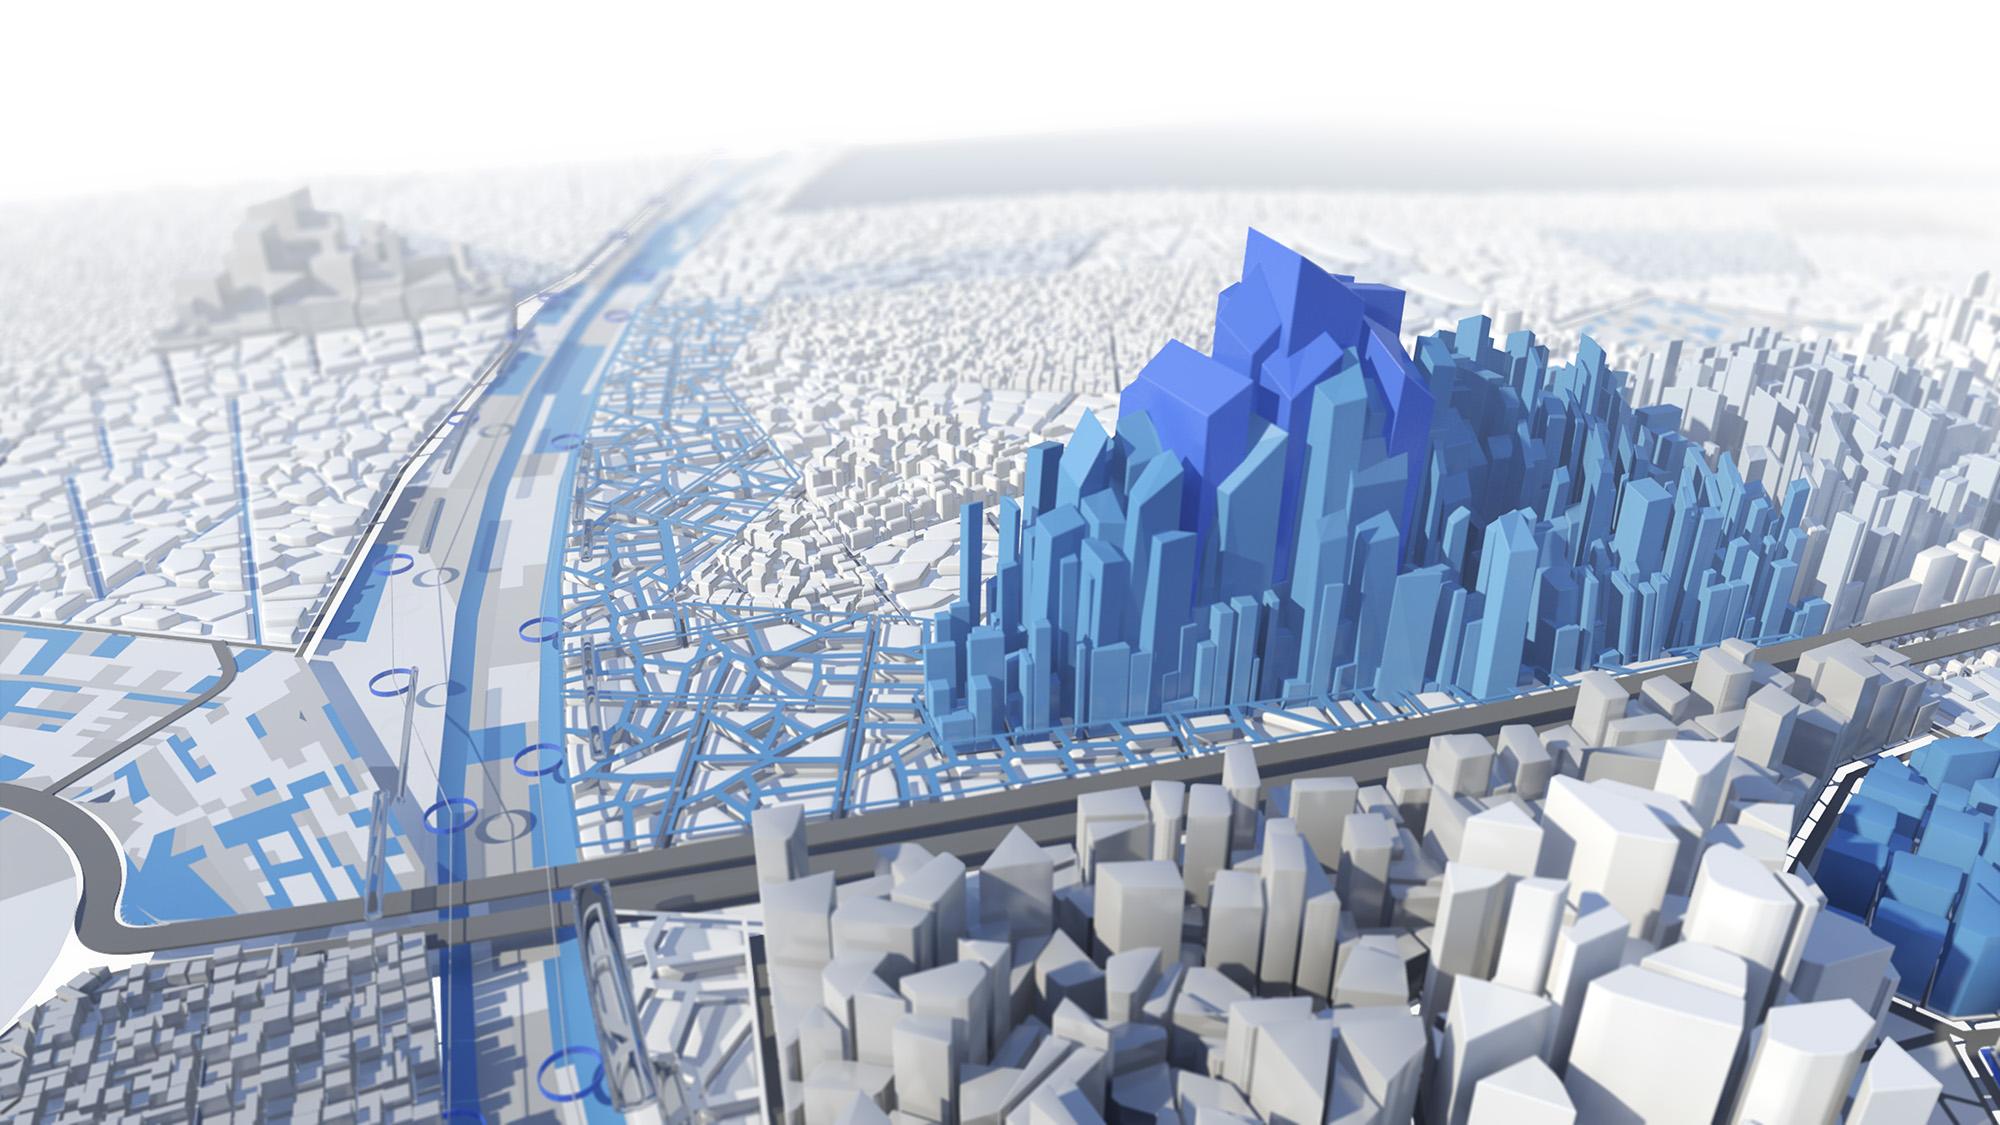 Aec collection bim p letinform ci s modellez s for Aec architecture engineering construction